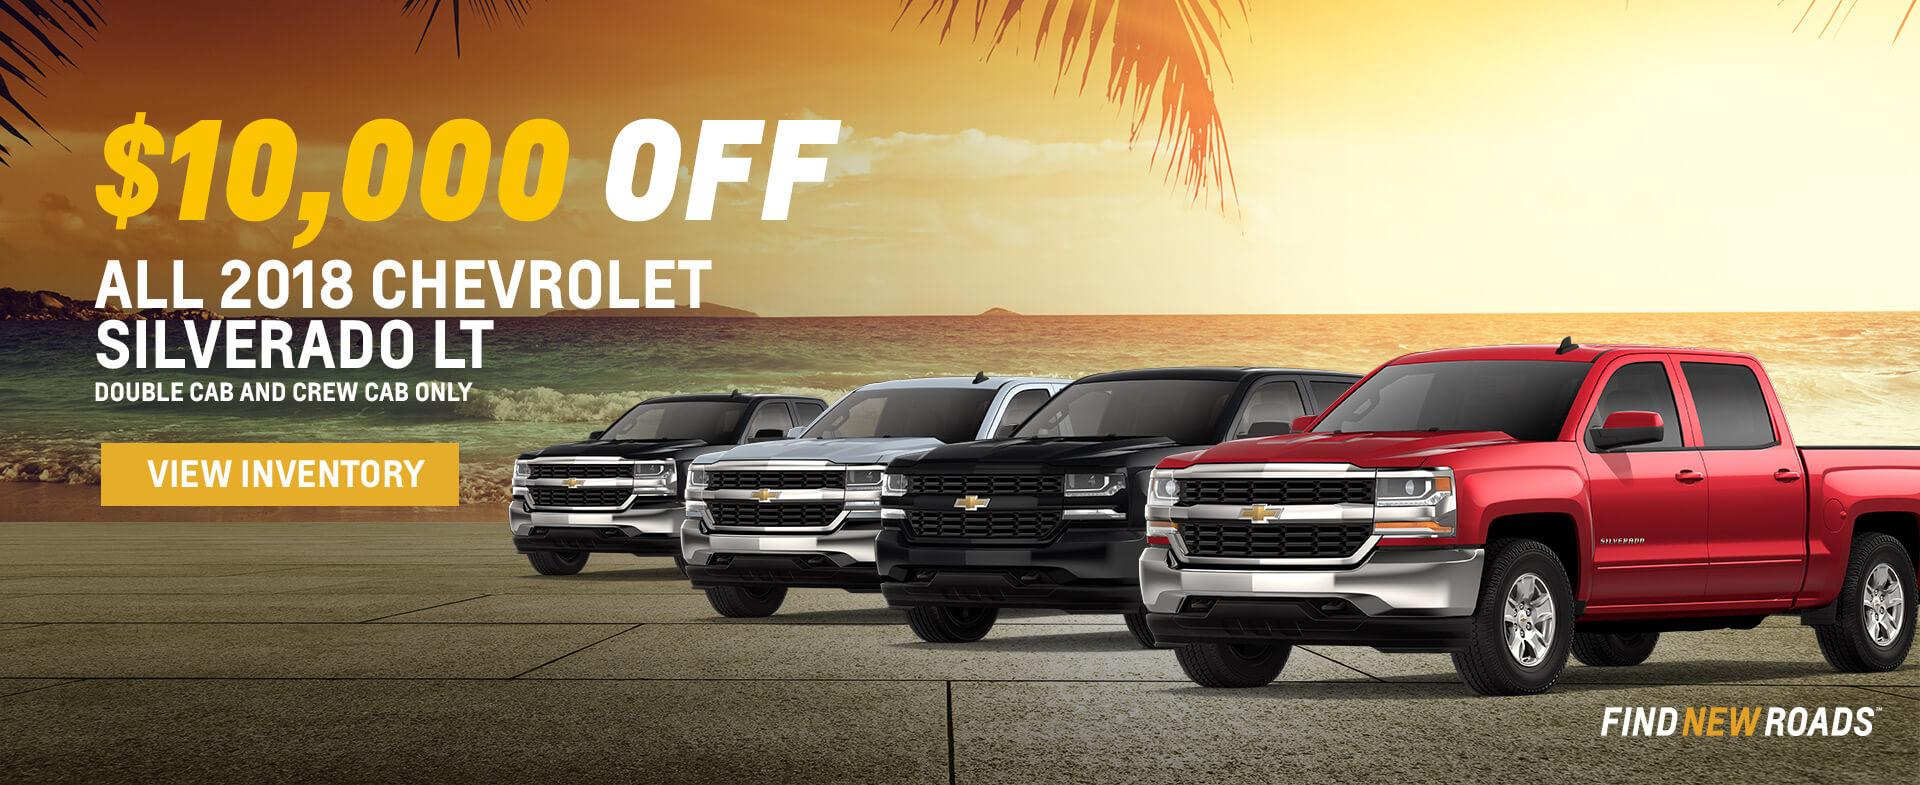 Chevrolet Dealer in Torrance   Long Beach, Orange County & Los Angeles